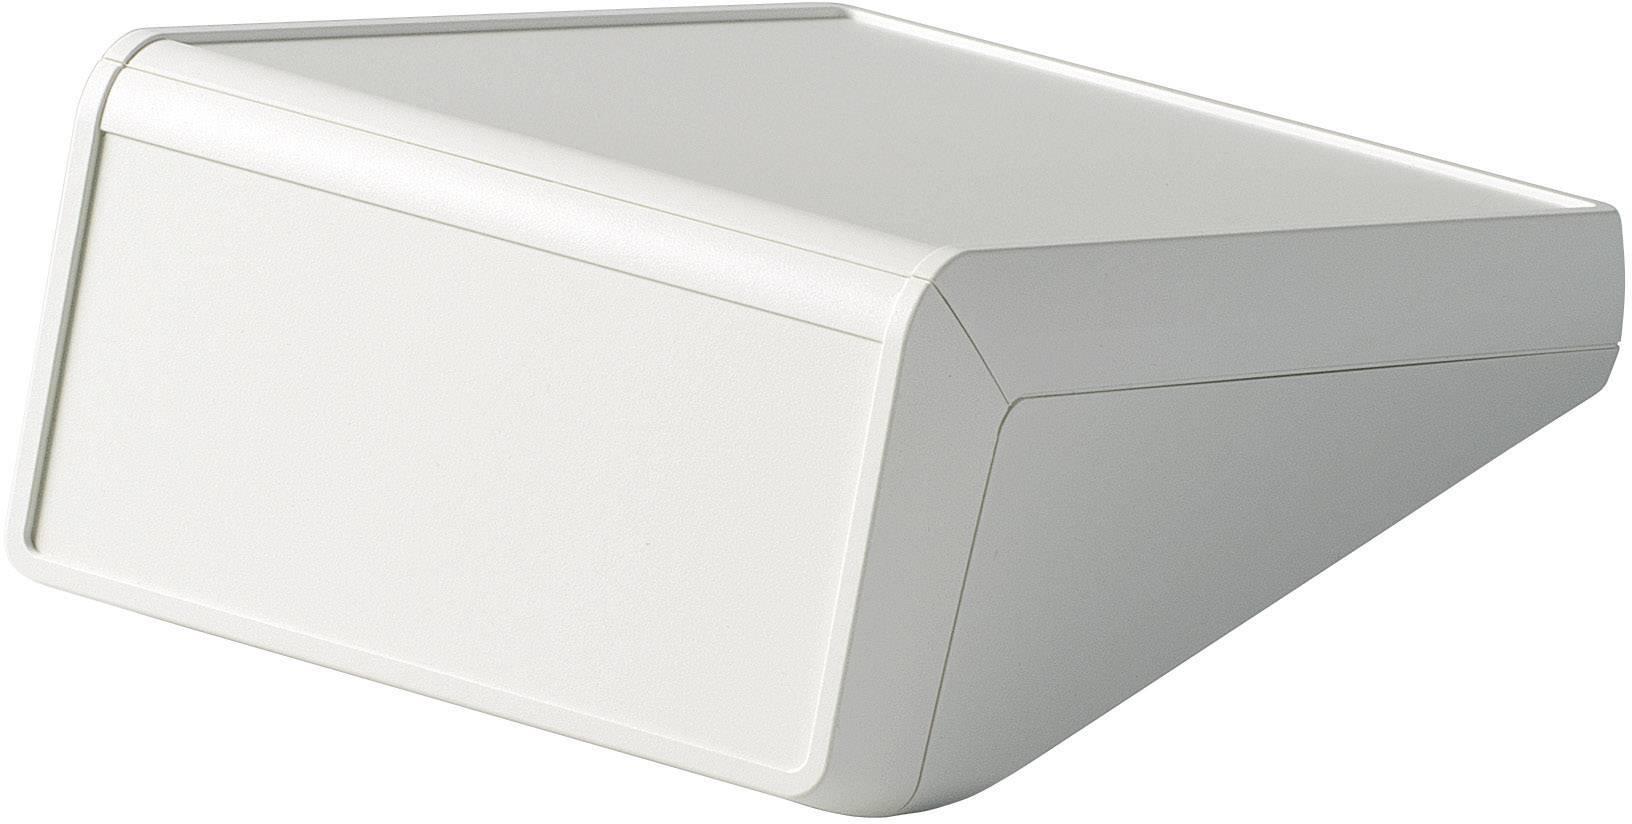 Skrinka na ovládací pult OKW UNITEC D4056317, 148 x 210 x 80 mm, ABS, sivobiela, 1 ks